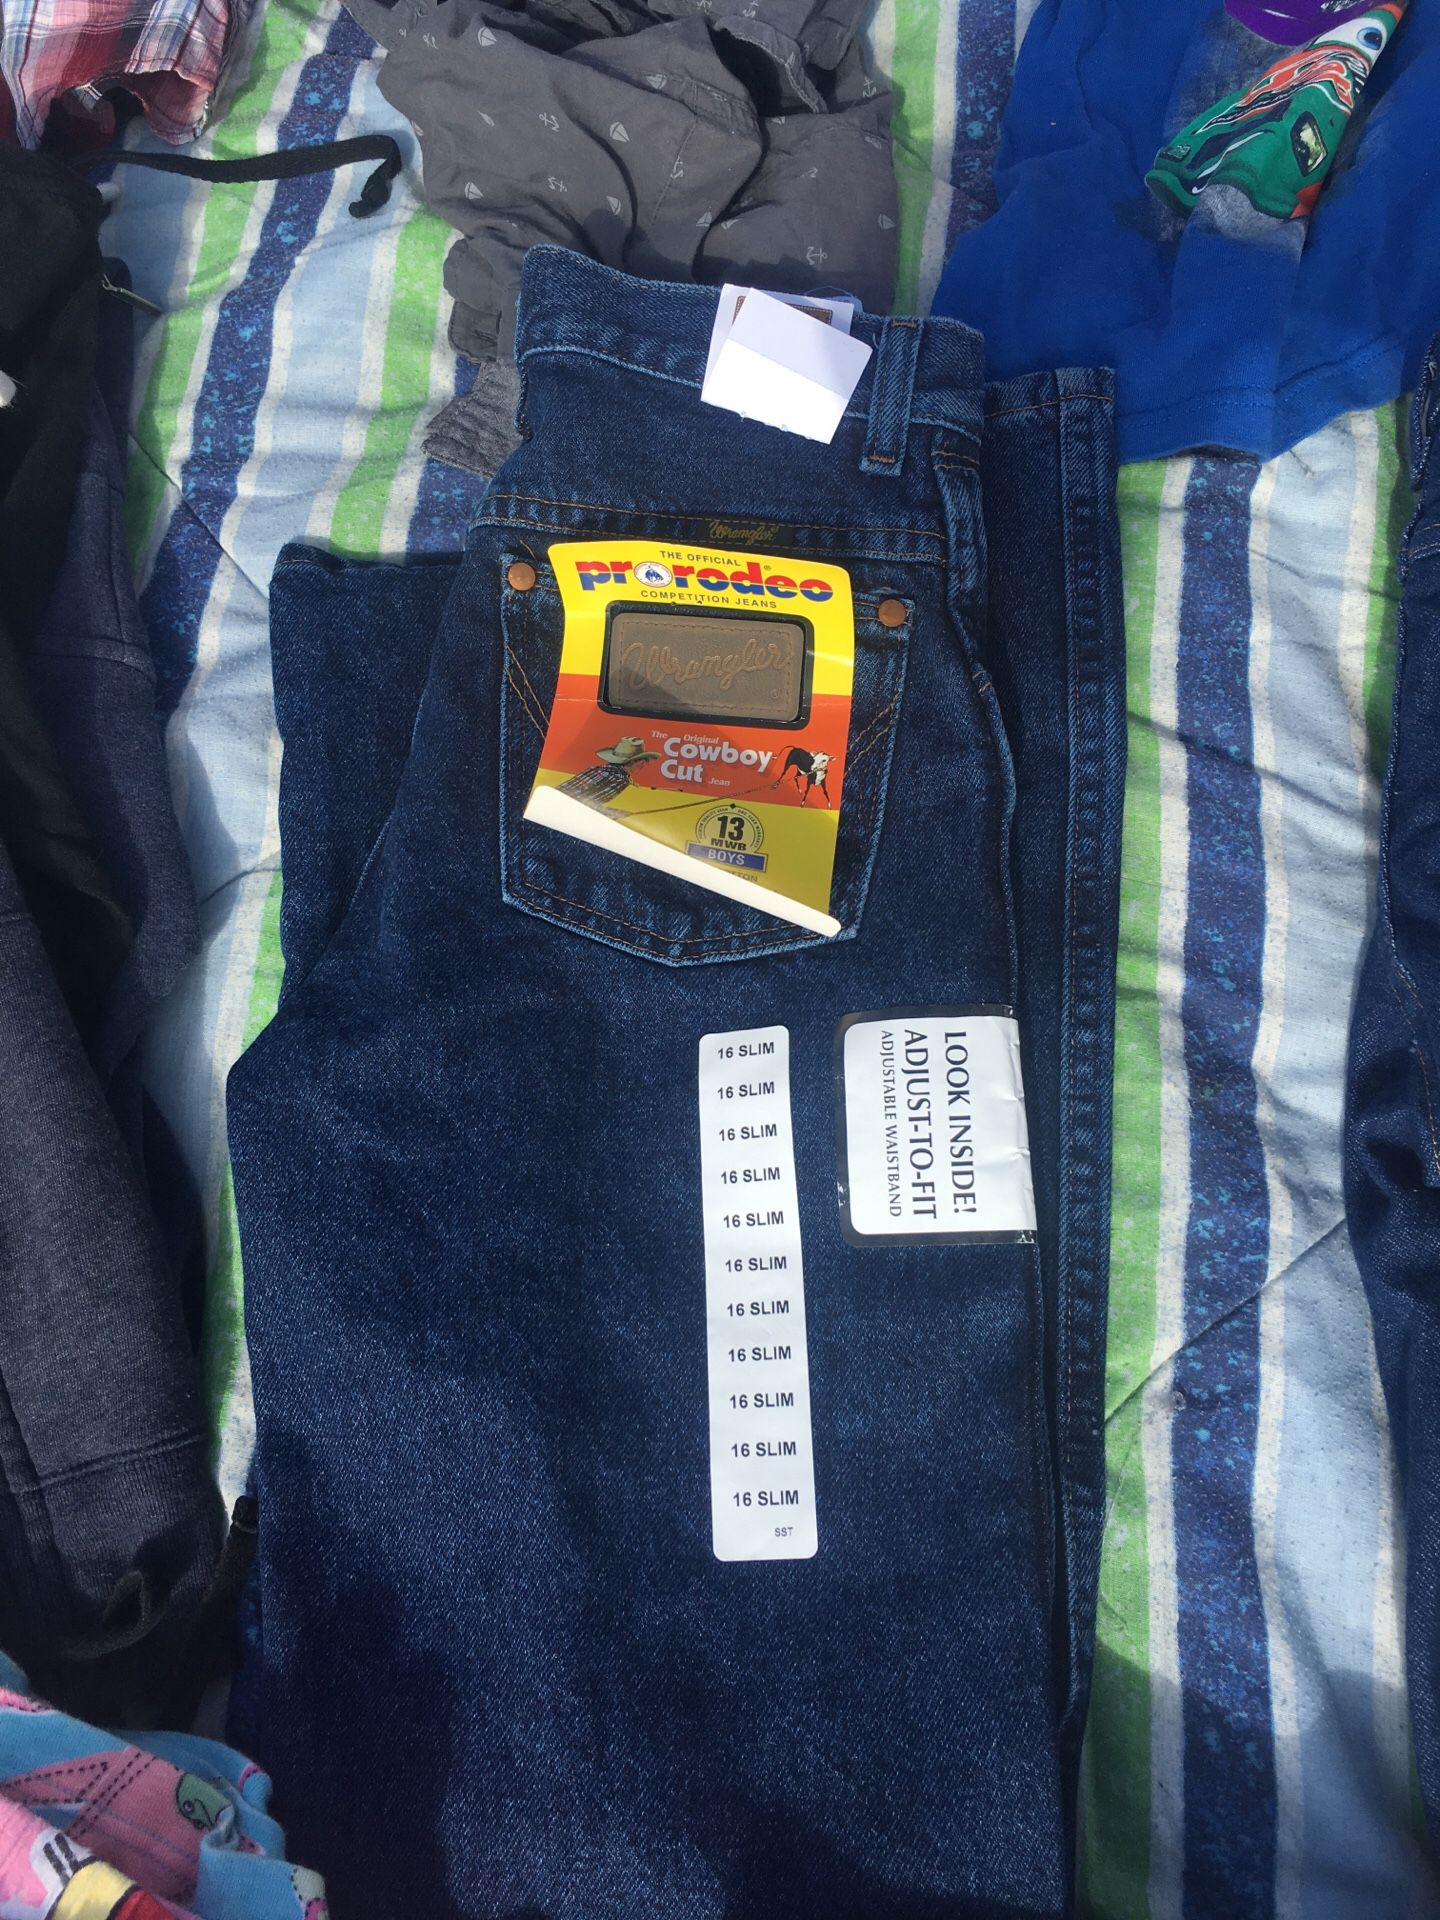 Wrangler pants size 16 slim and 14 regular 2 for $40